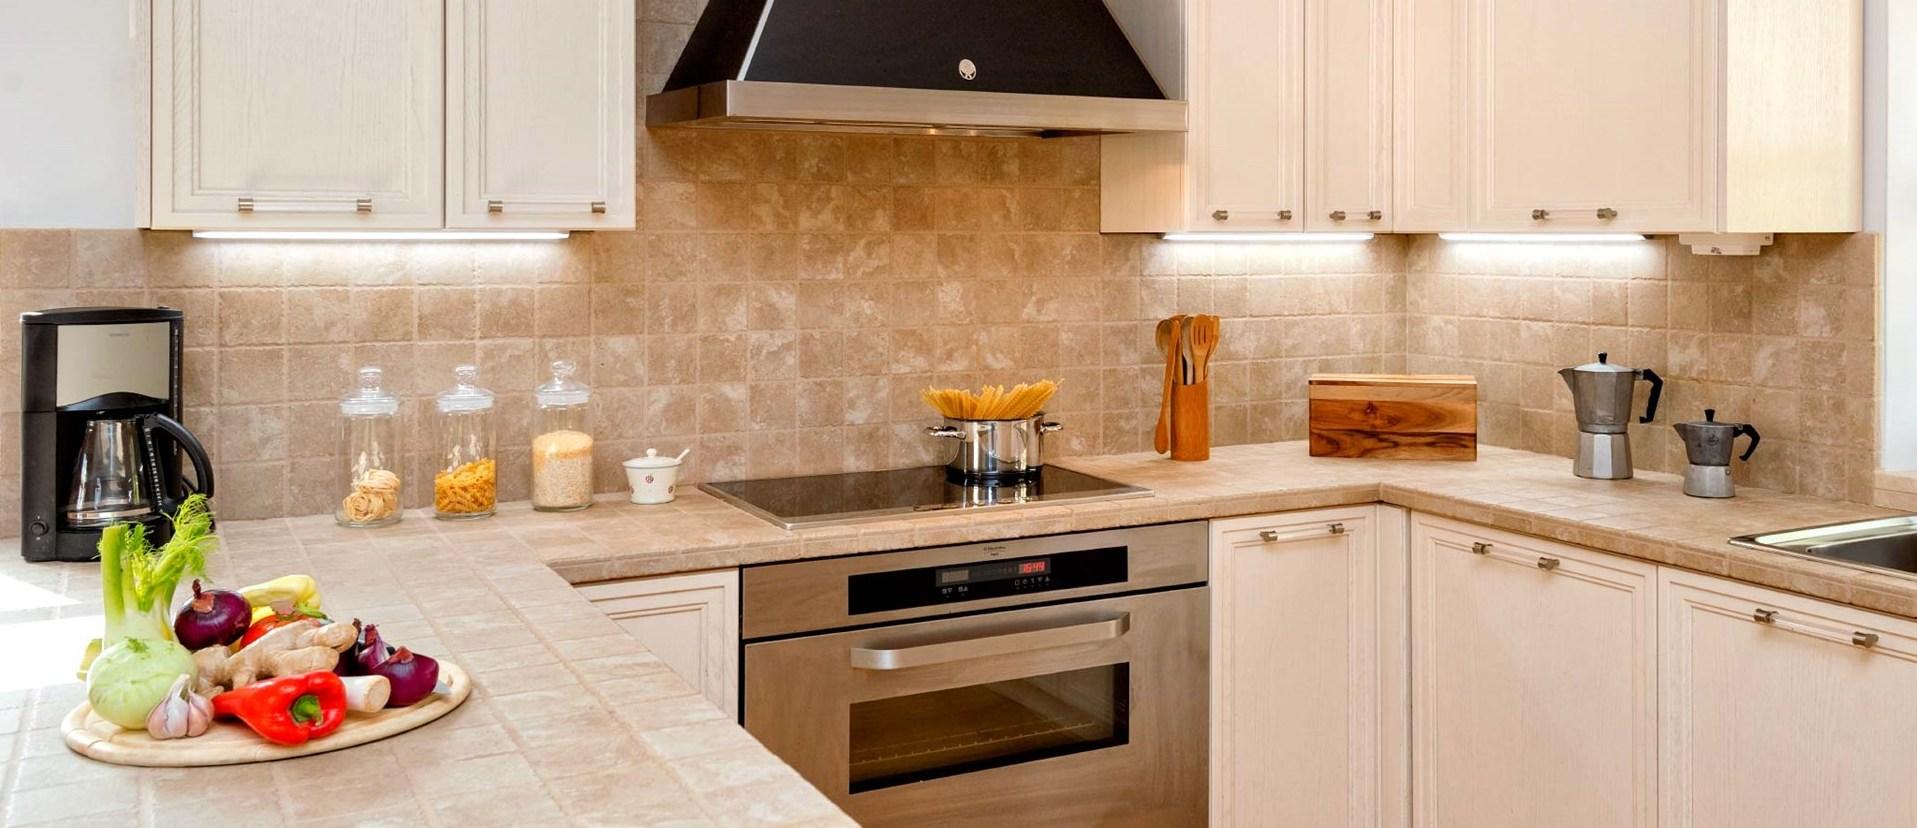 hvar-house-family-villa-kitchen